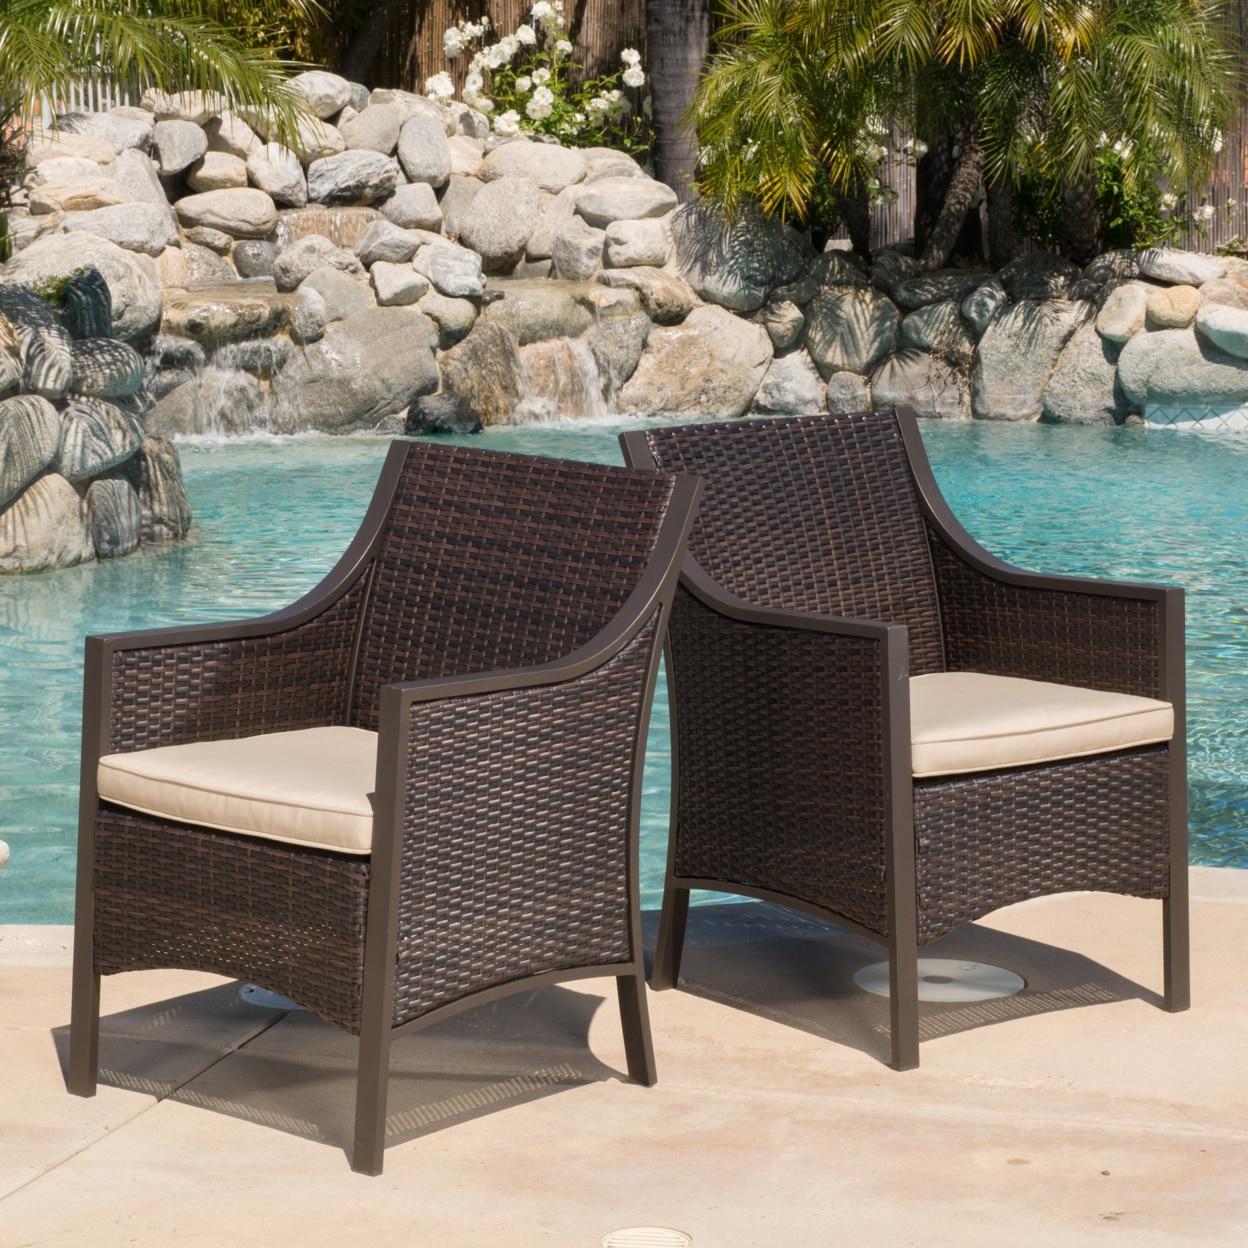 где купить Orchard Outdoor Brown Wicker Dining Chair w/ Cushion (Set of 2) по лучшей цене